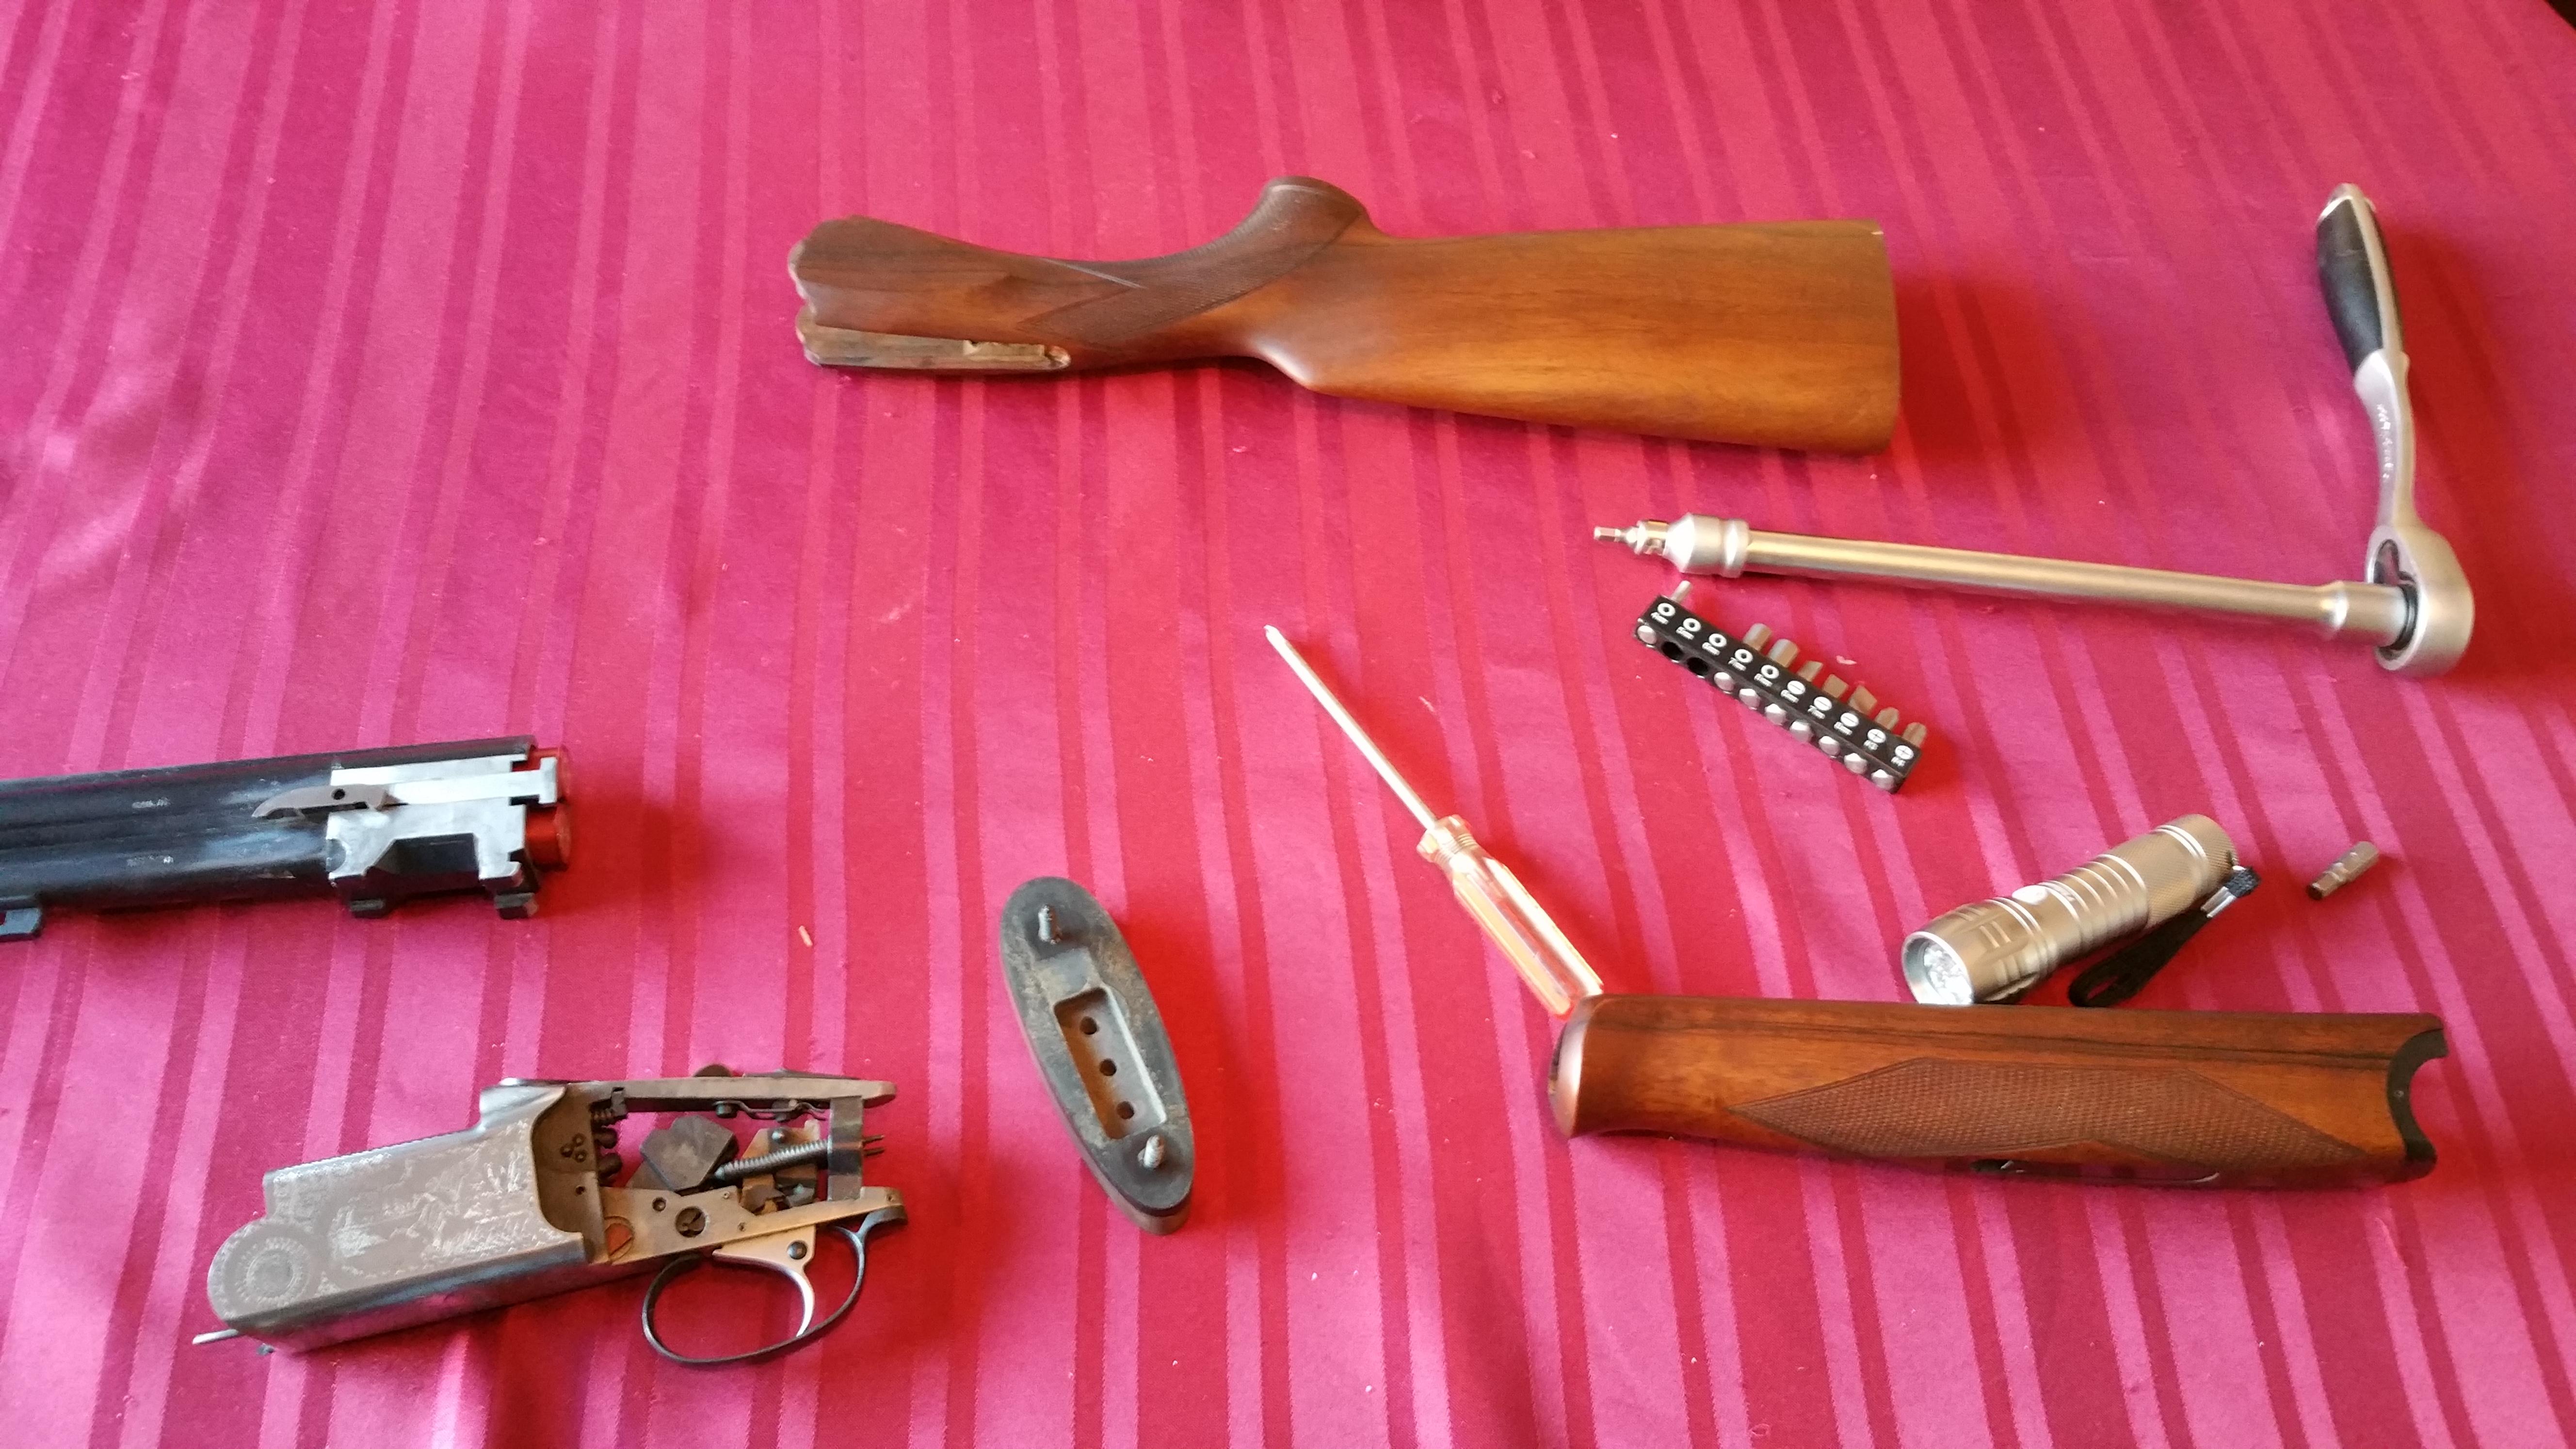 Silma Shotgun Stripping Action Repairing Ejector - Ste Gough